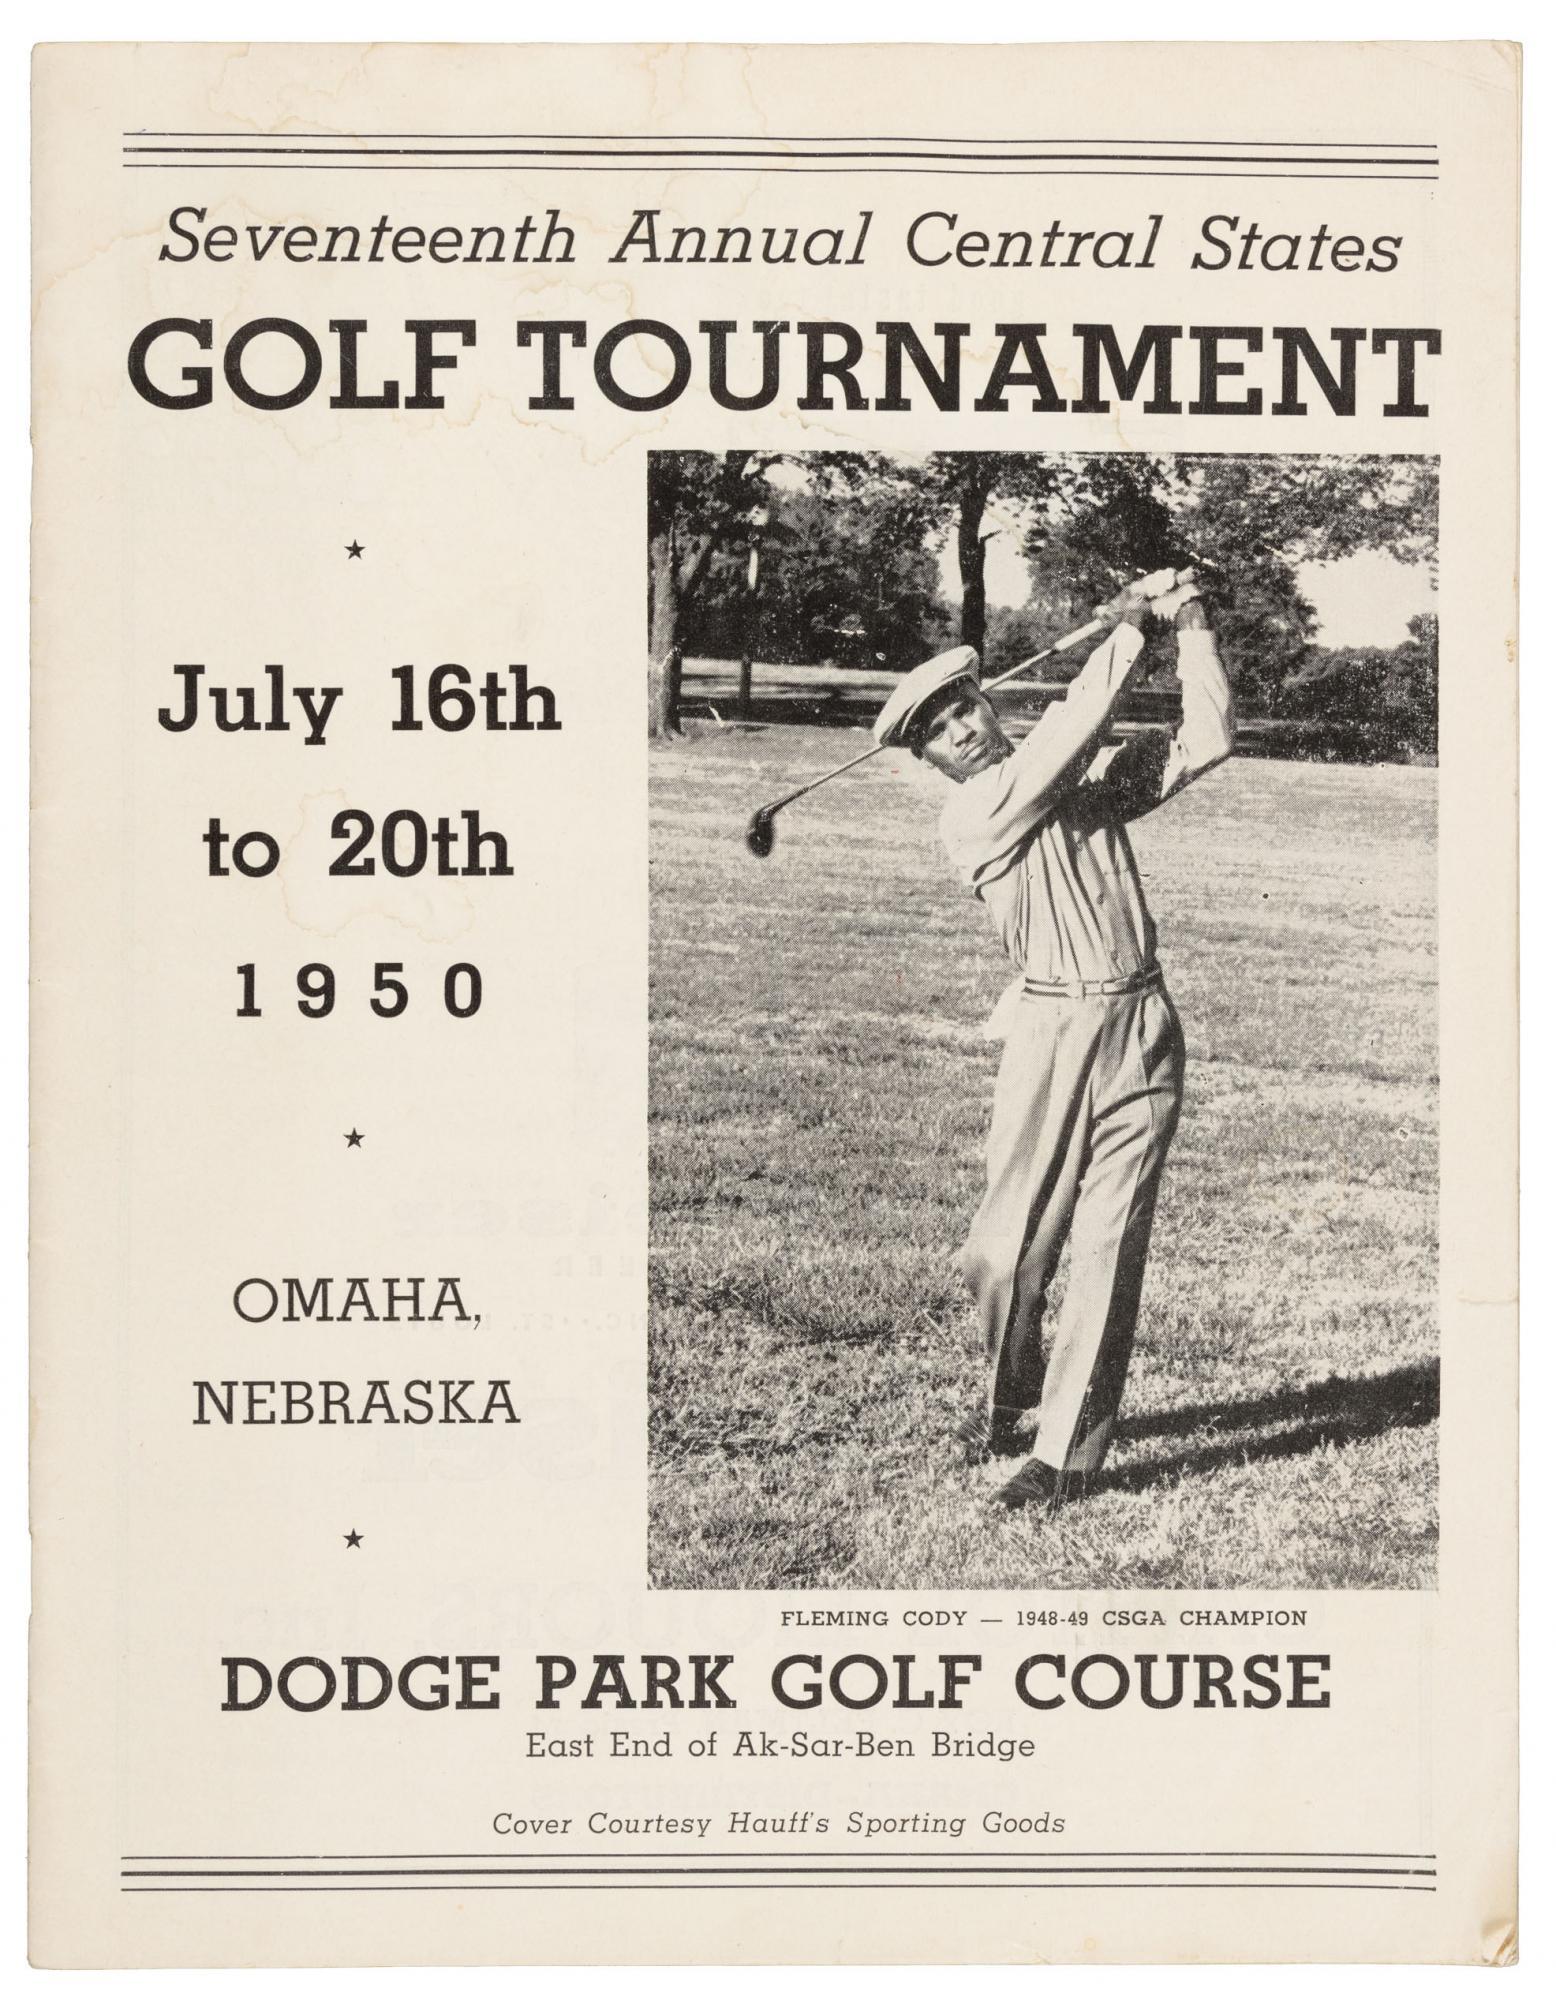 Fine Golf Books, Clubs & Memorabilia